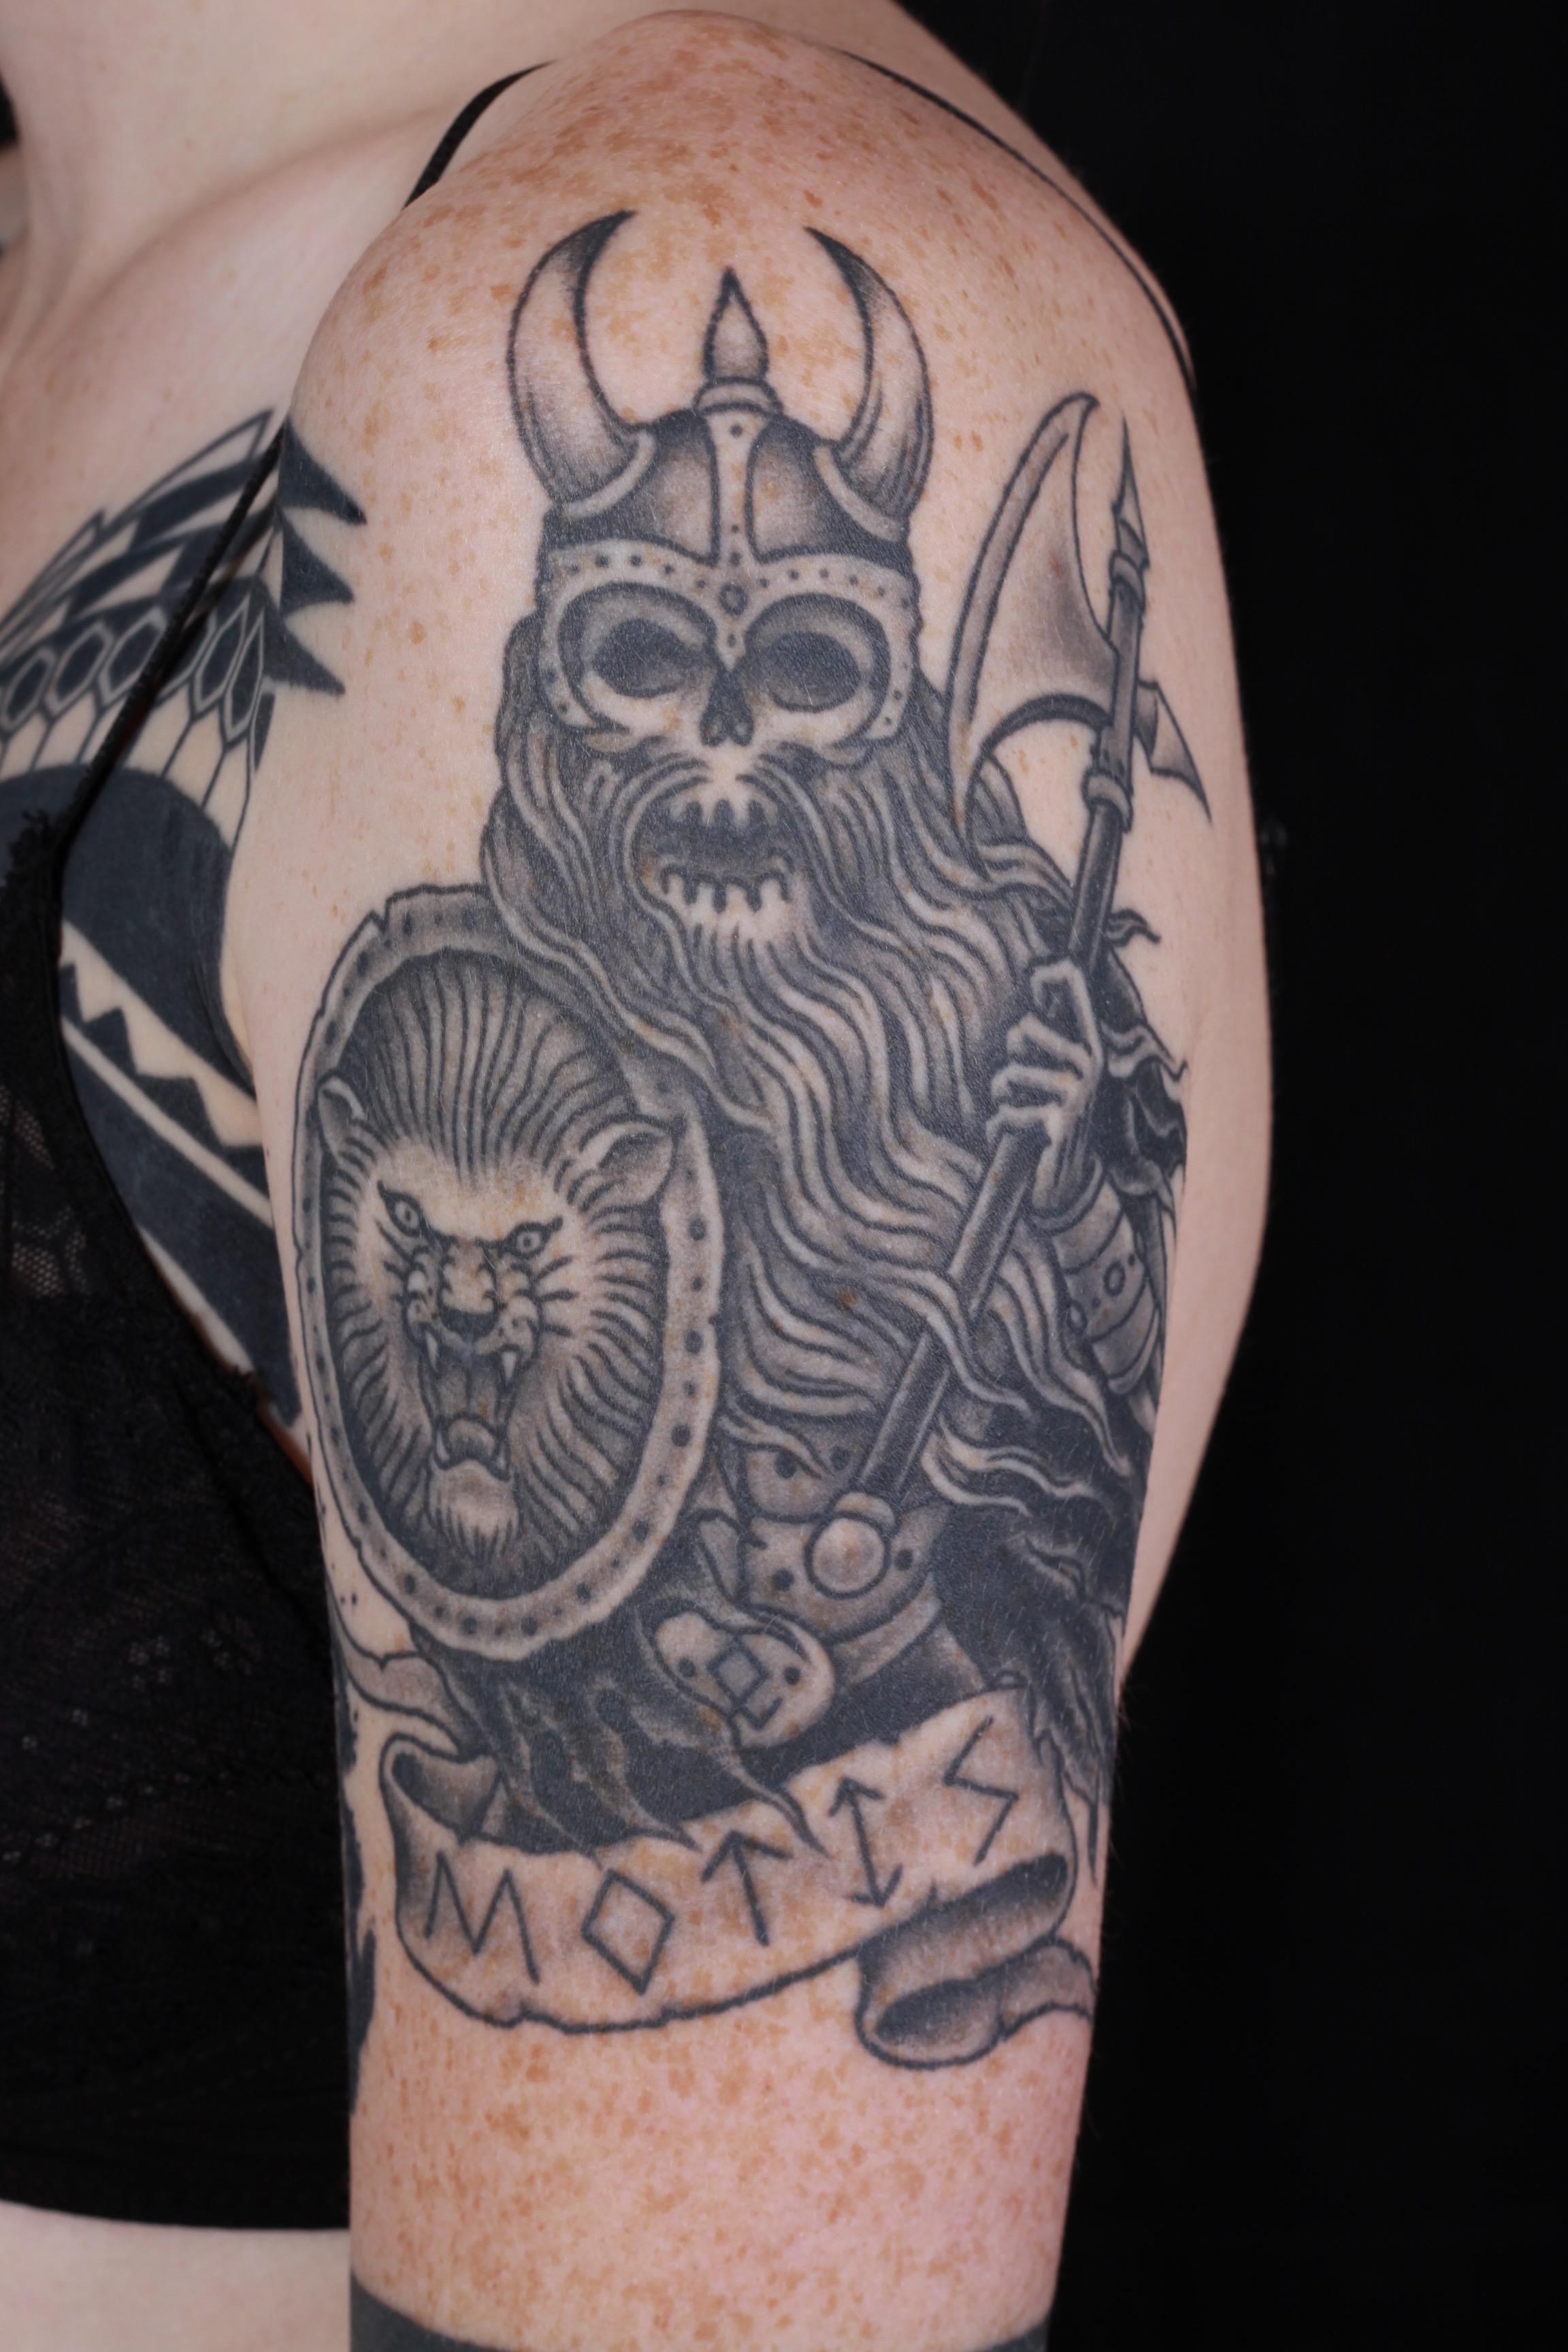 sam-yamini-dedication-tattoo-black-and-grey-viking-skull-axe-runes-arm